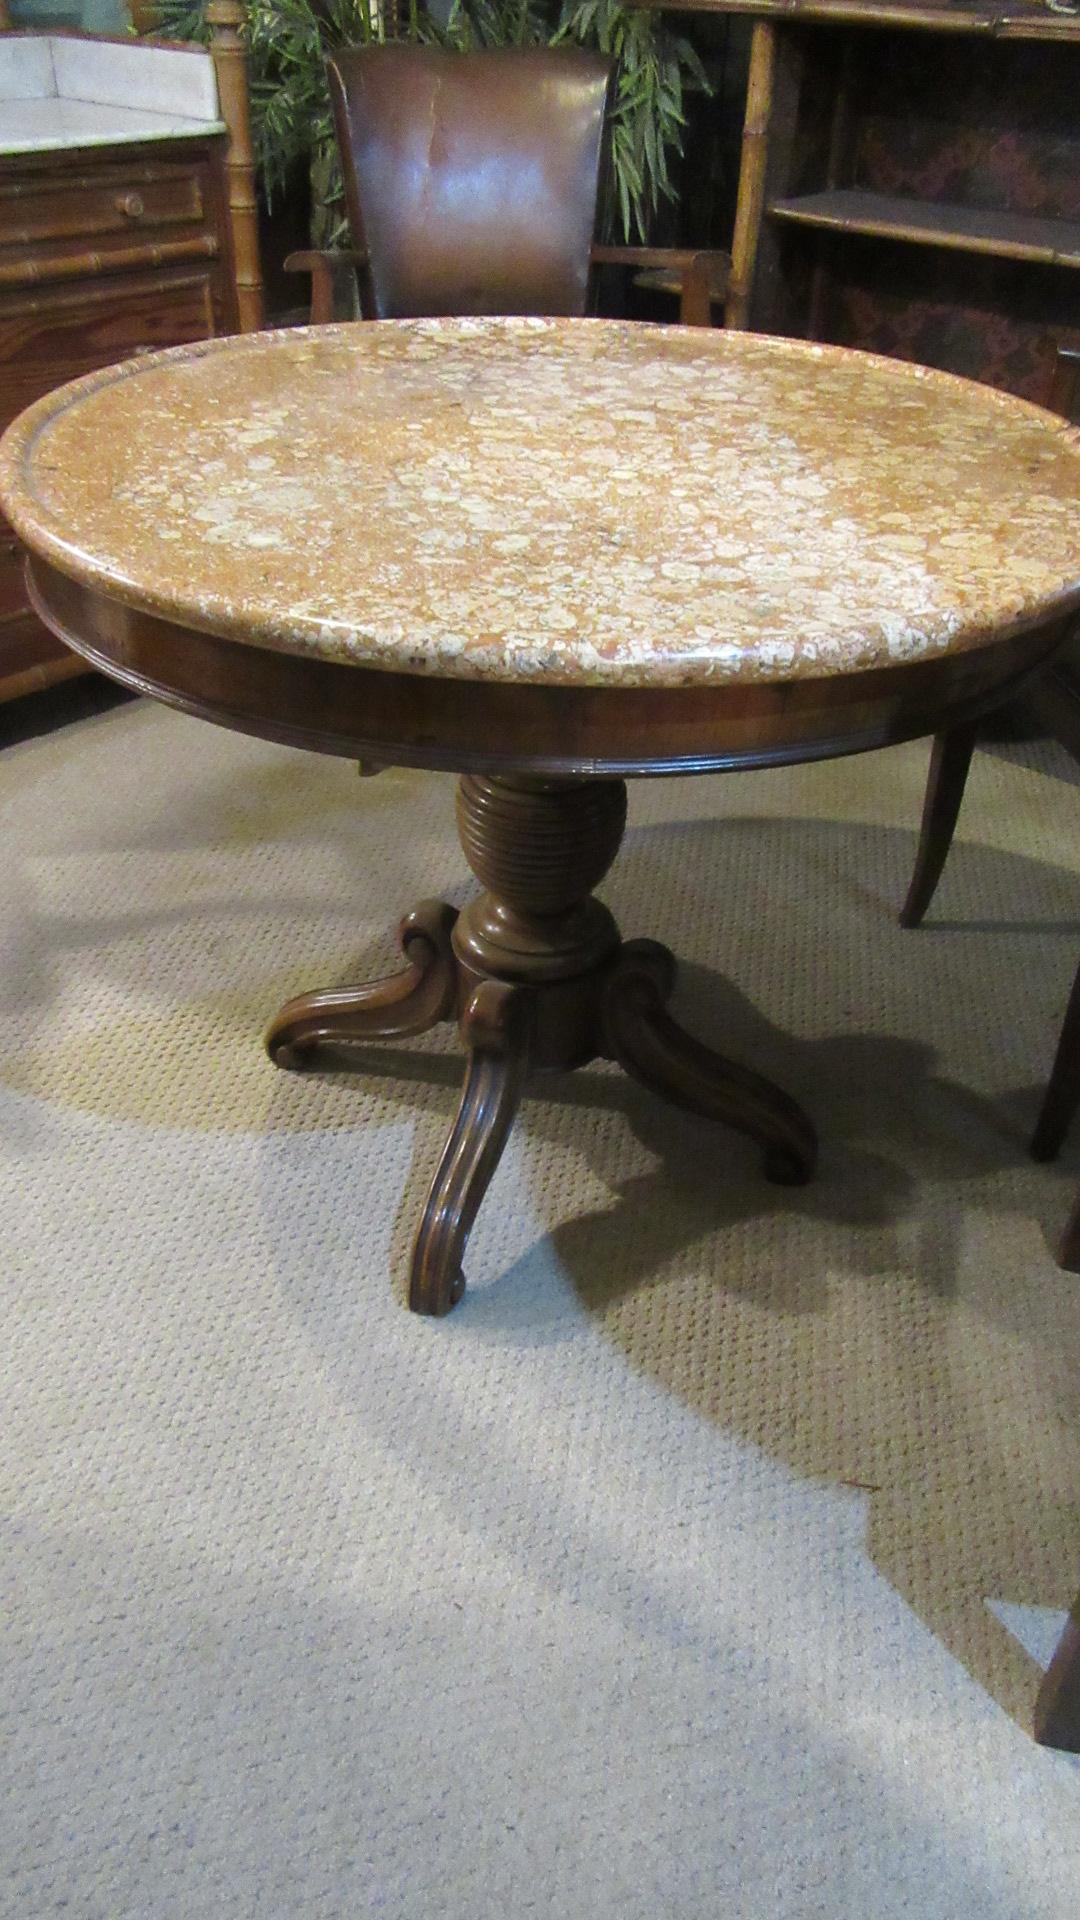 ANTIQUE FRENCH FRUIT WOOD GUIRIDON TABLE